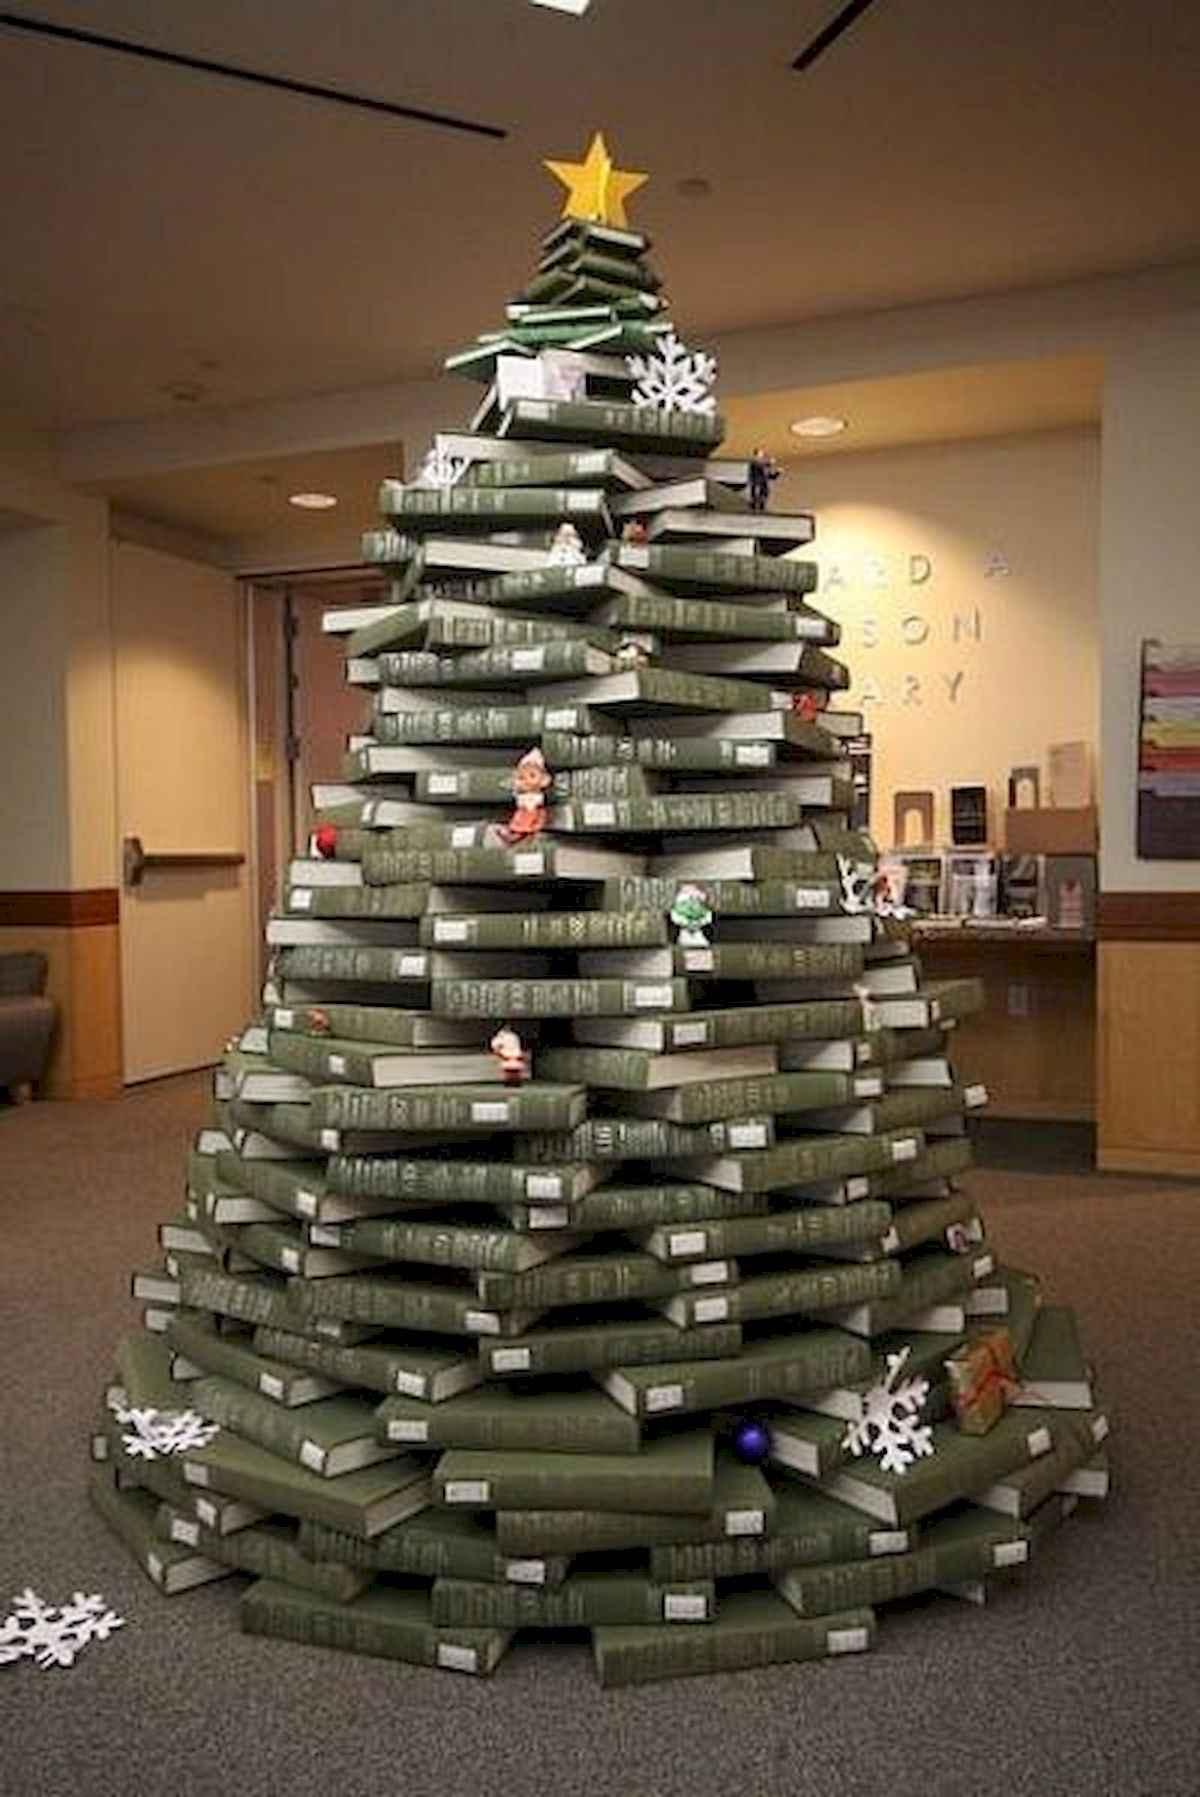 40 unique christmas tree ideas decorations (8)